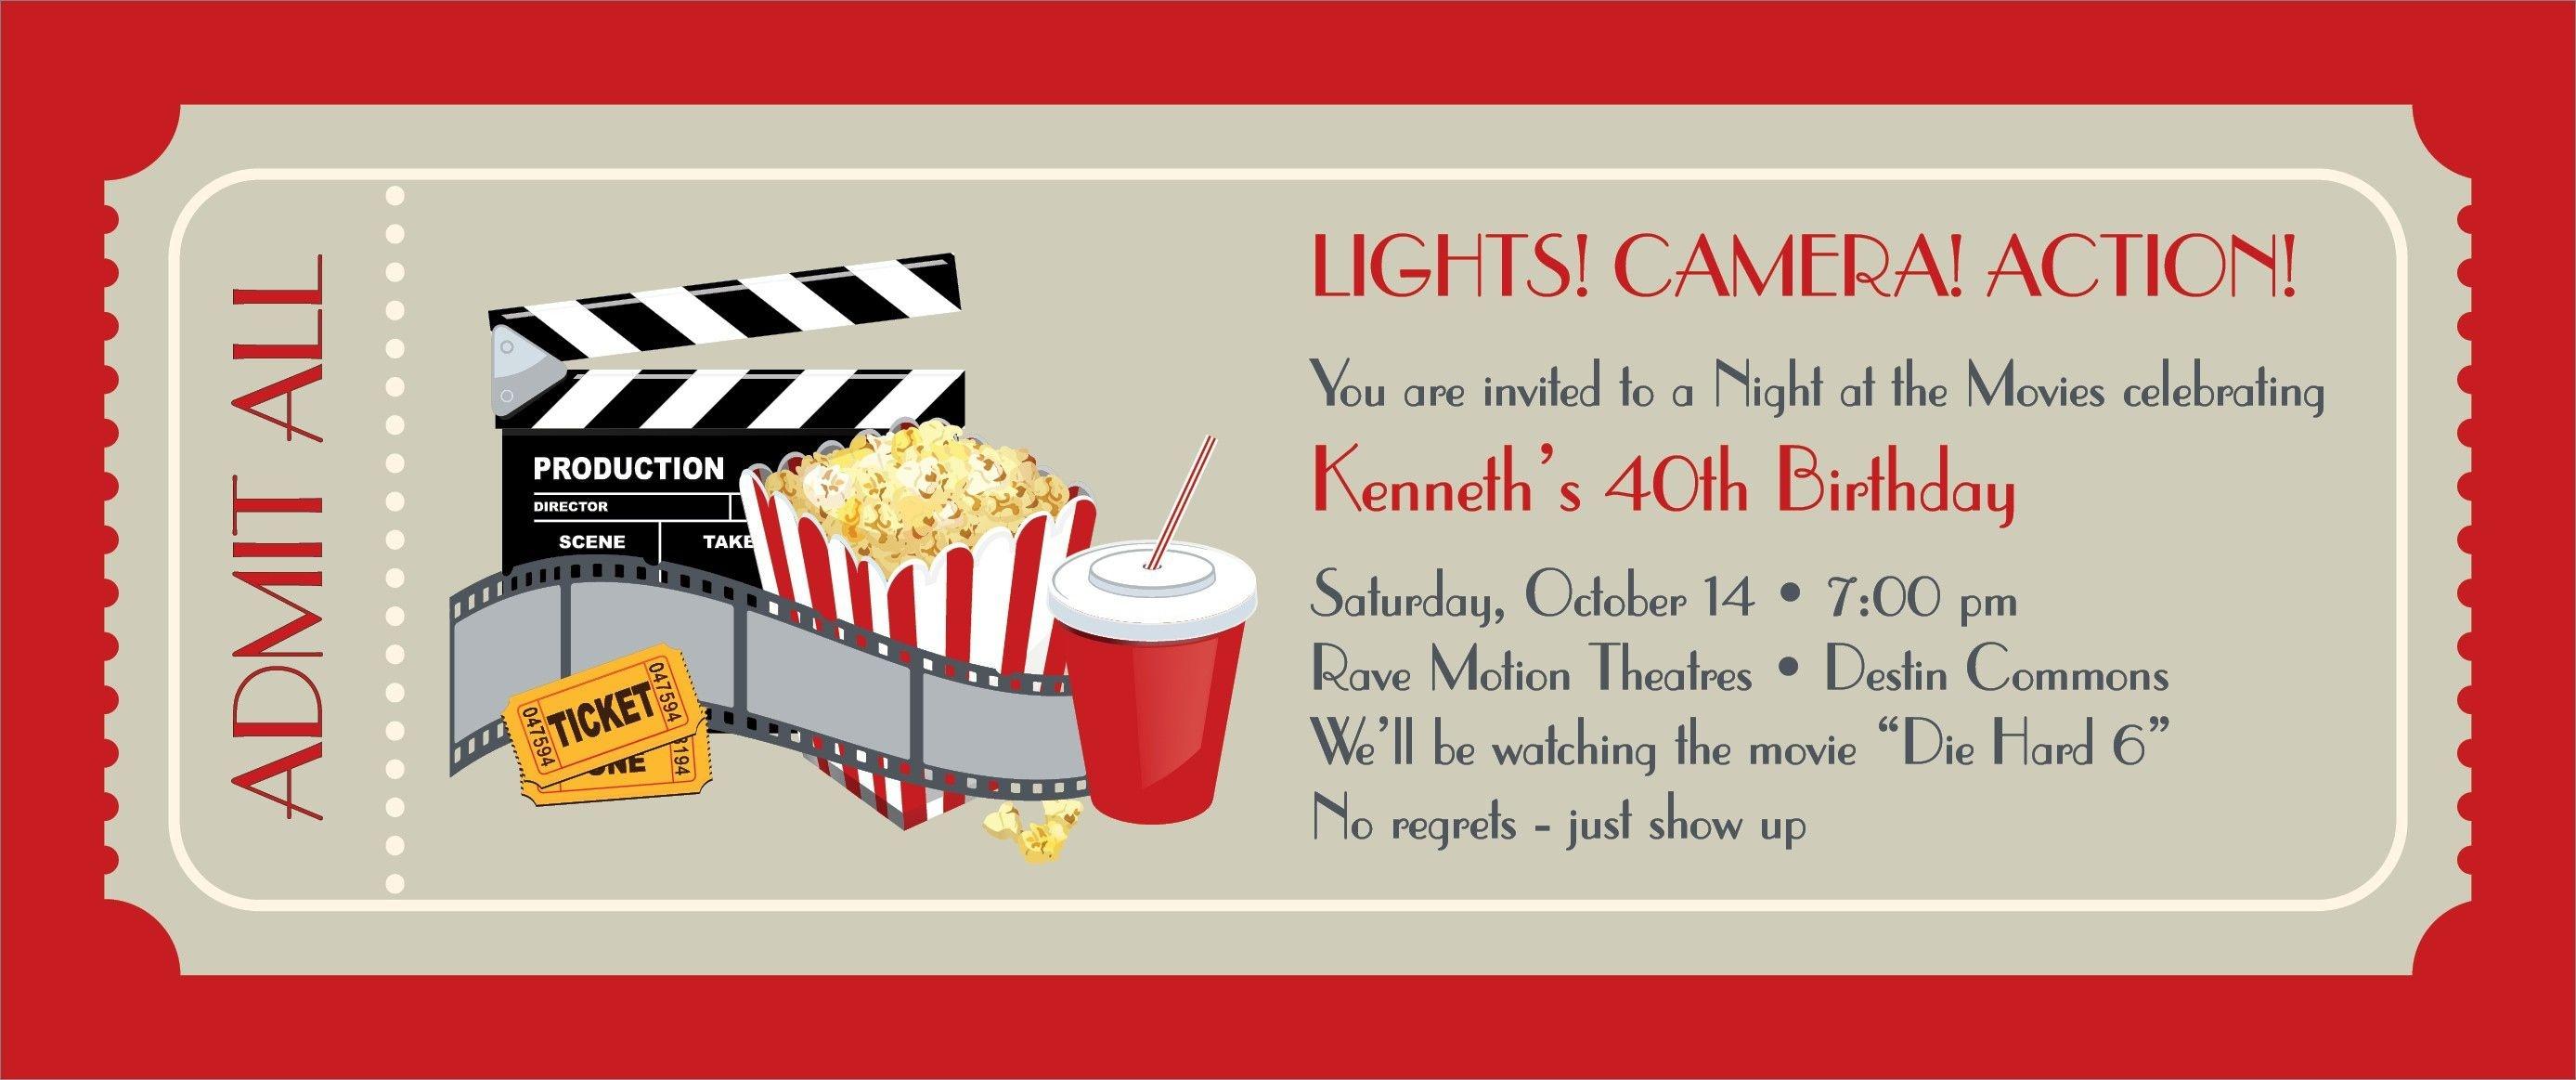 Free Printable Ticket Invitations Inspiration Movie Party - Free Printable Movie Ticket Birthday Party Invitations